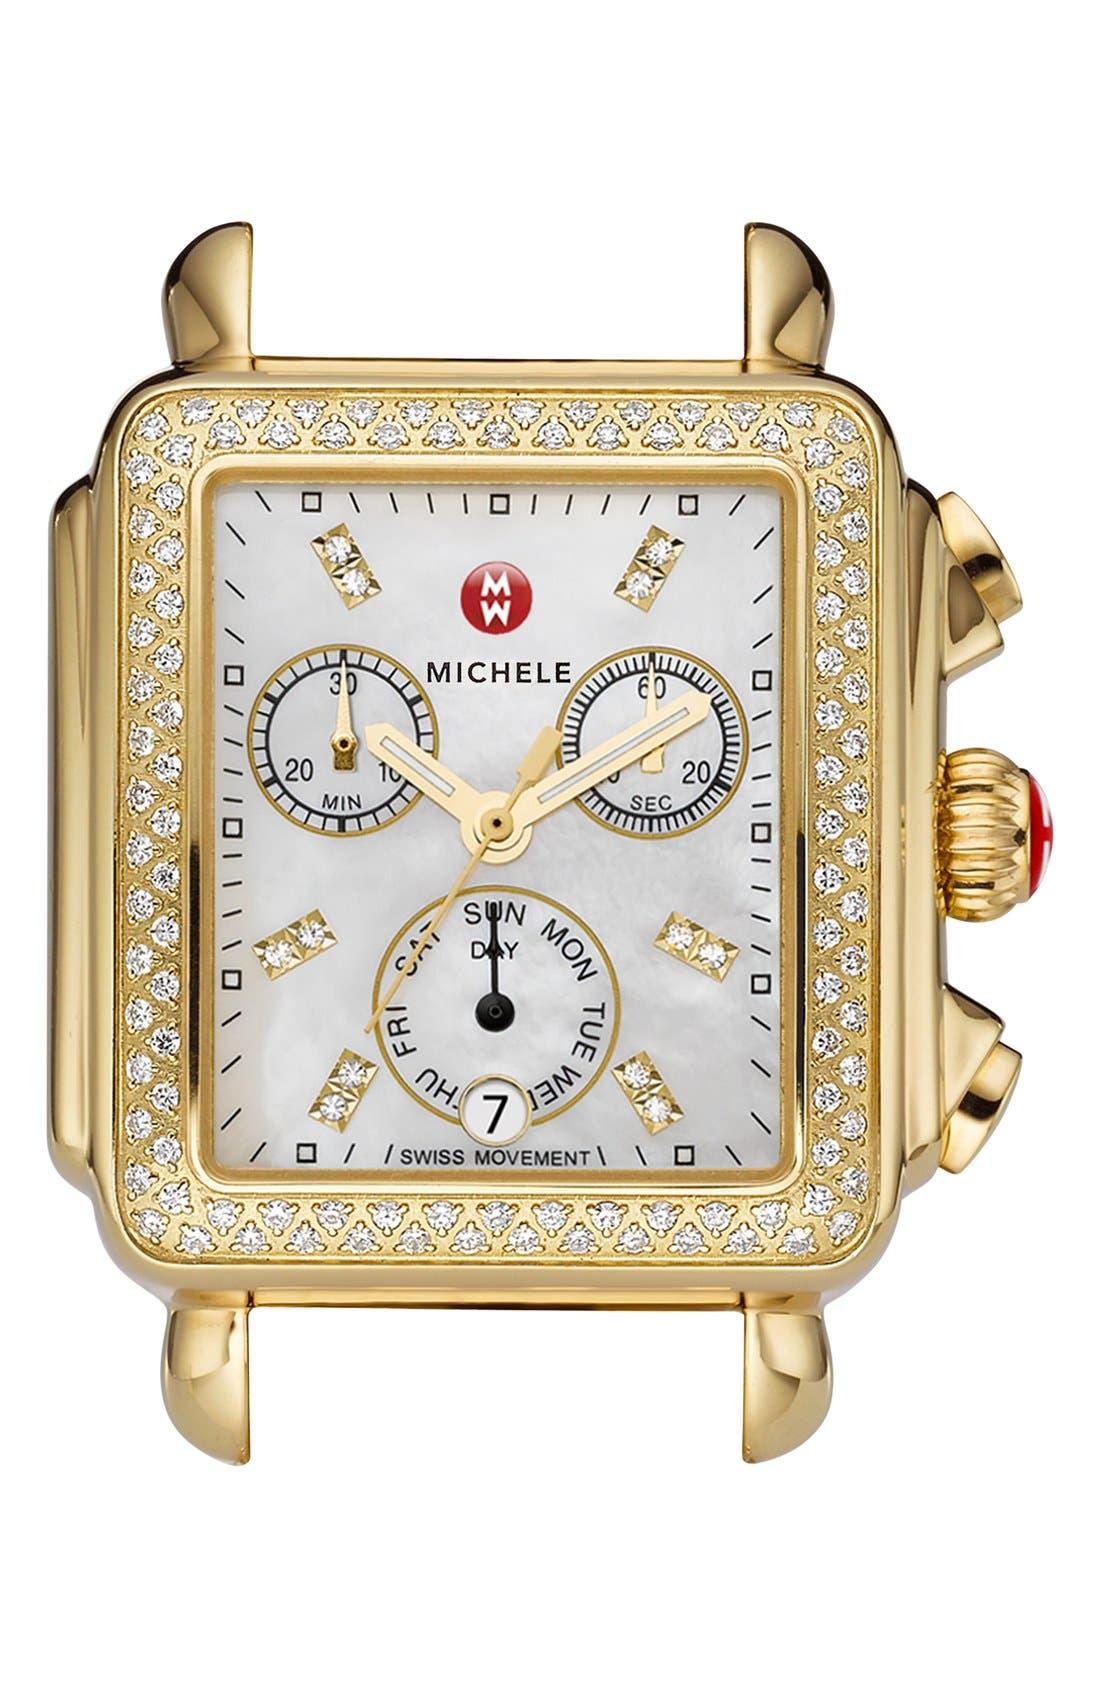 MICHELE Deco Diamond Diamond Dial Gold Plated Watch Case, 33mm x 35mm